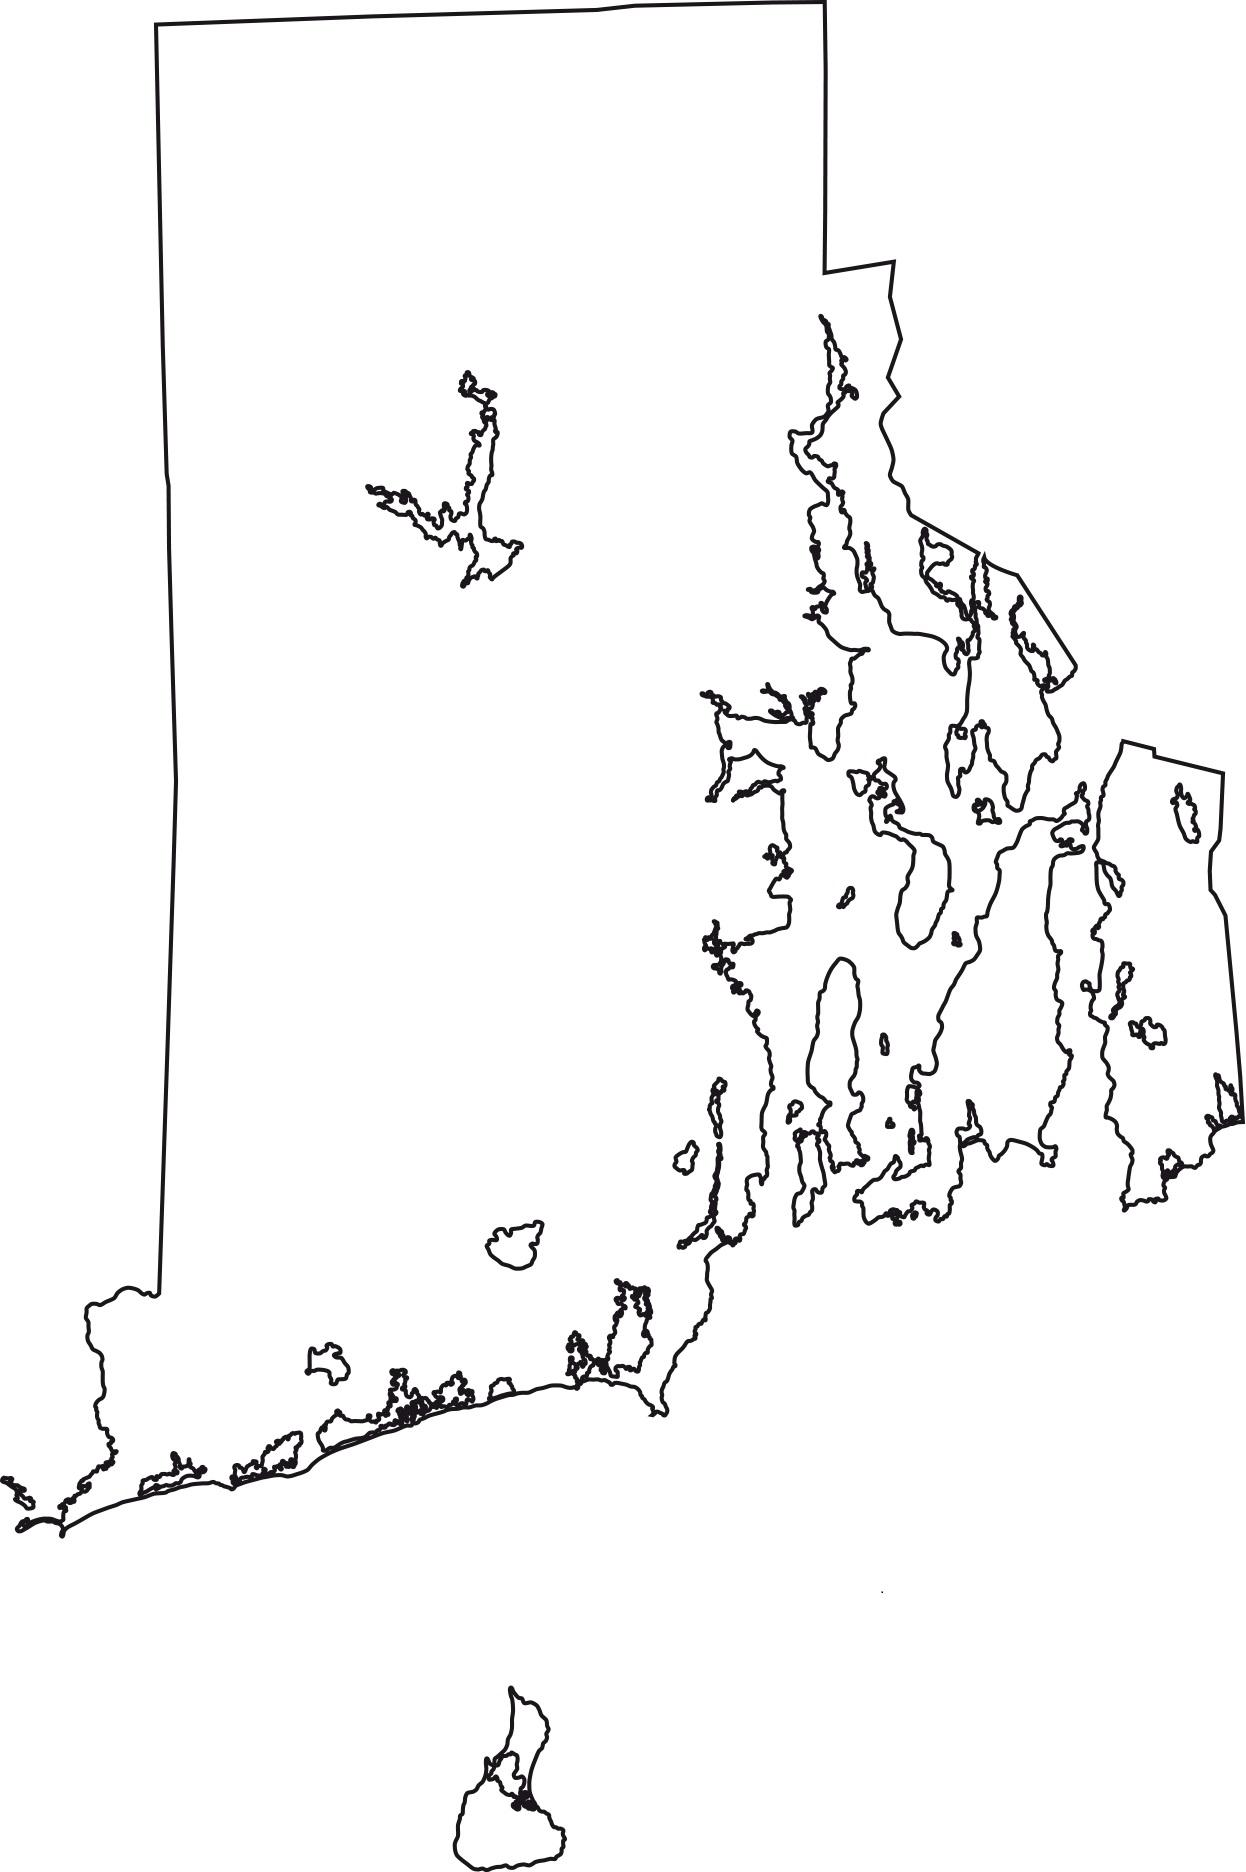 Rhode Island Blank Outline Map | Large Printable Standard Map